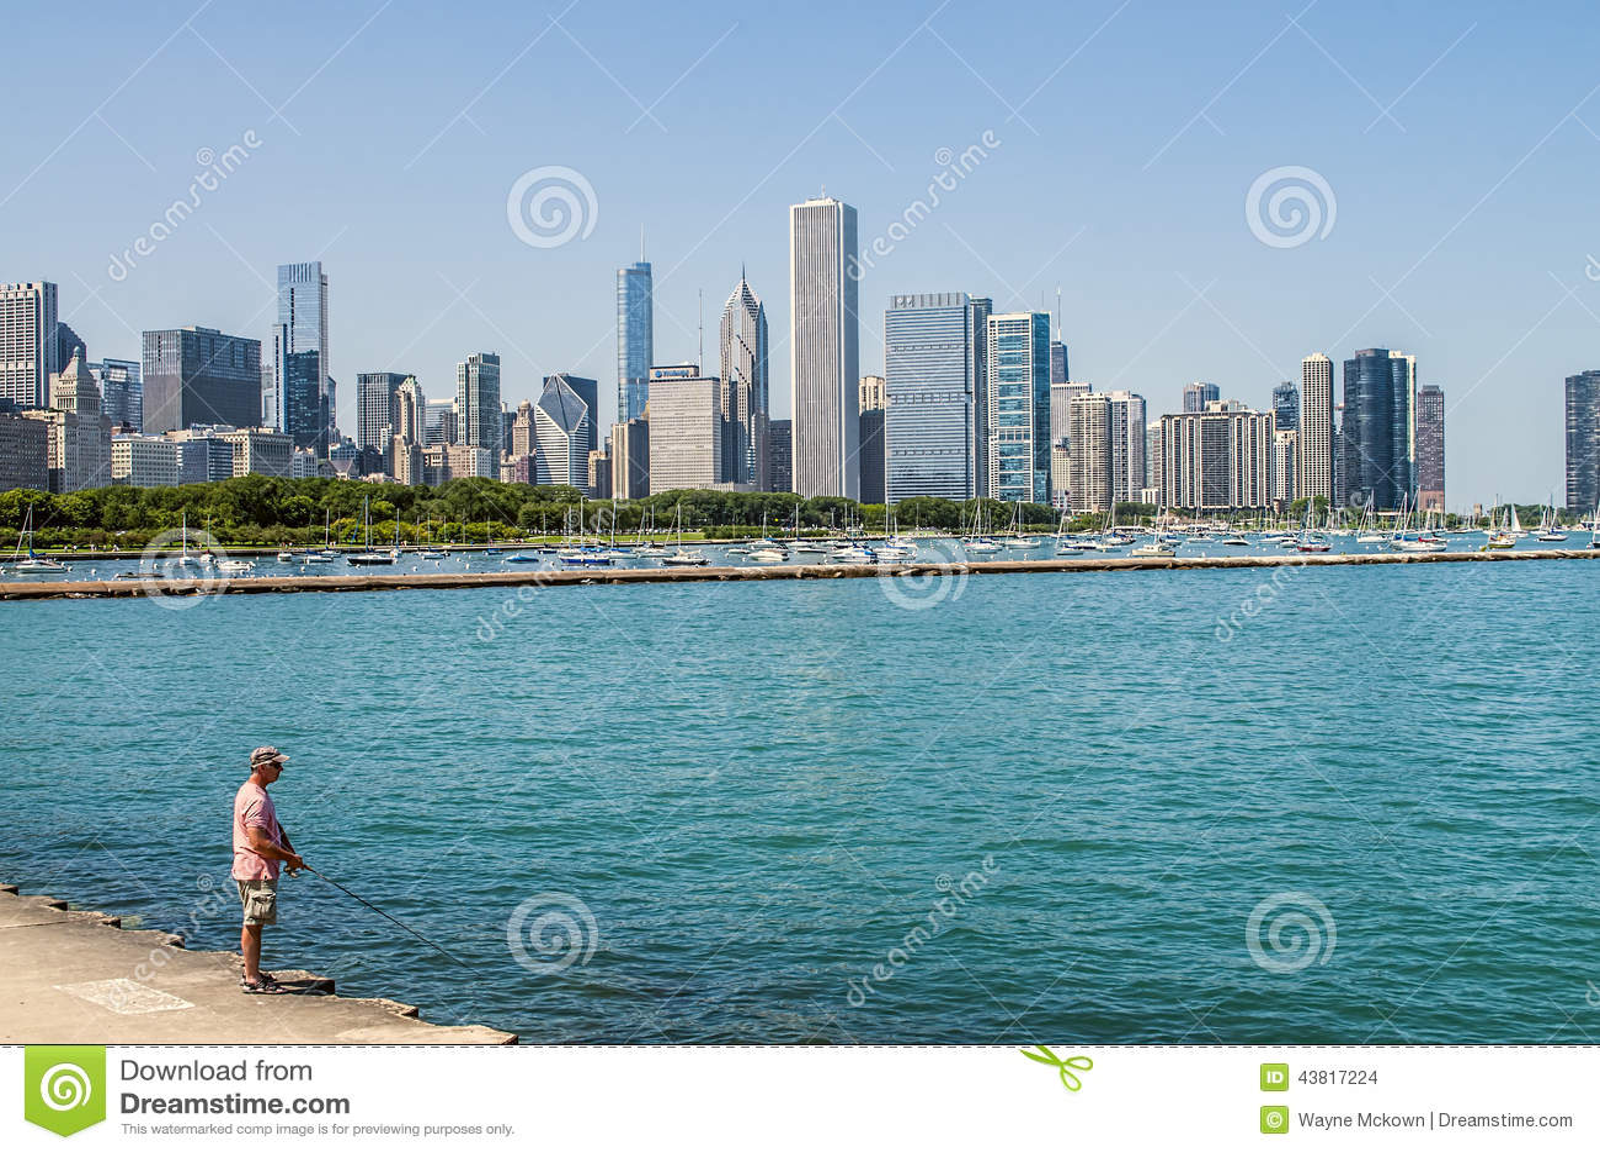 Man fishing on lake michigian editorial stock image for Fishing in chicago